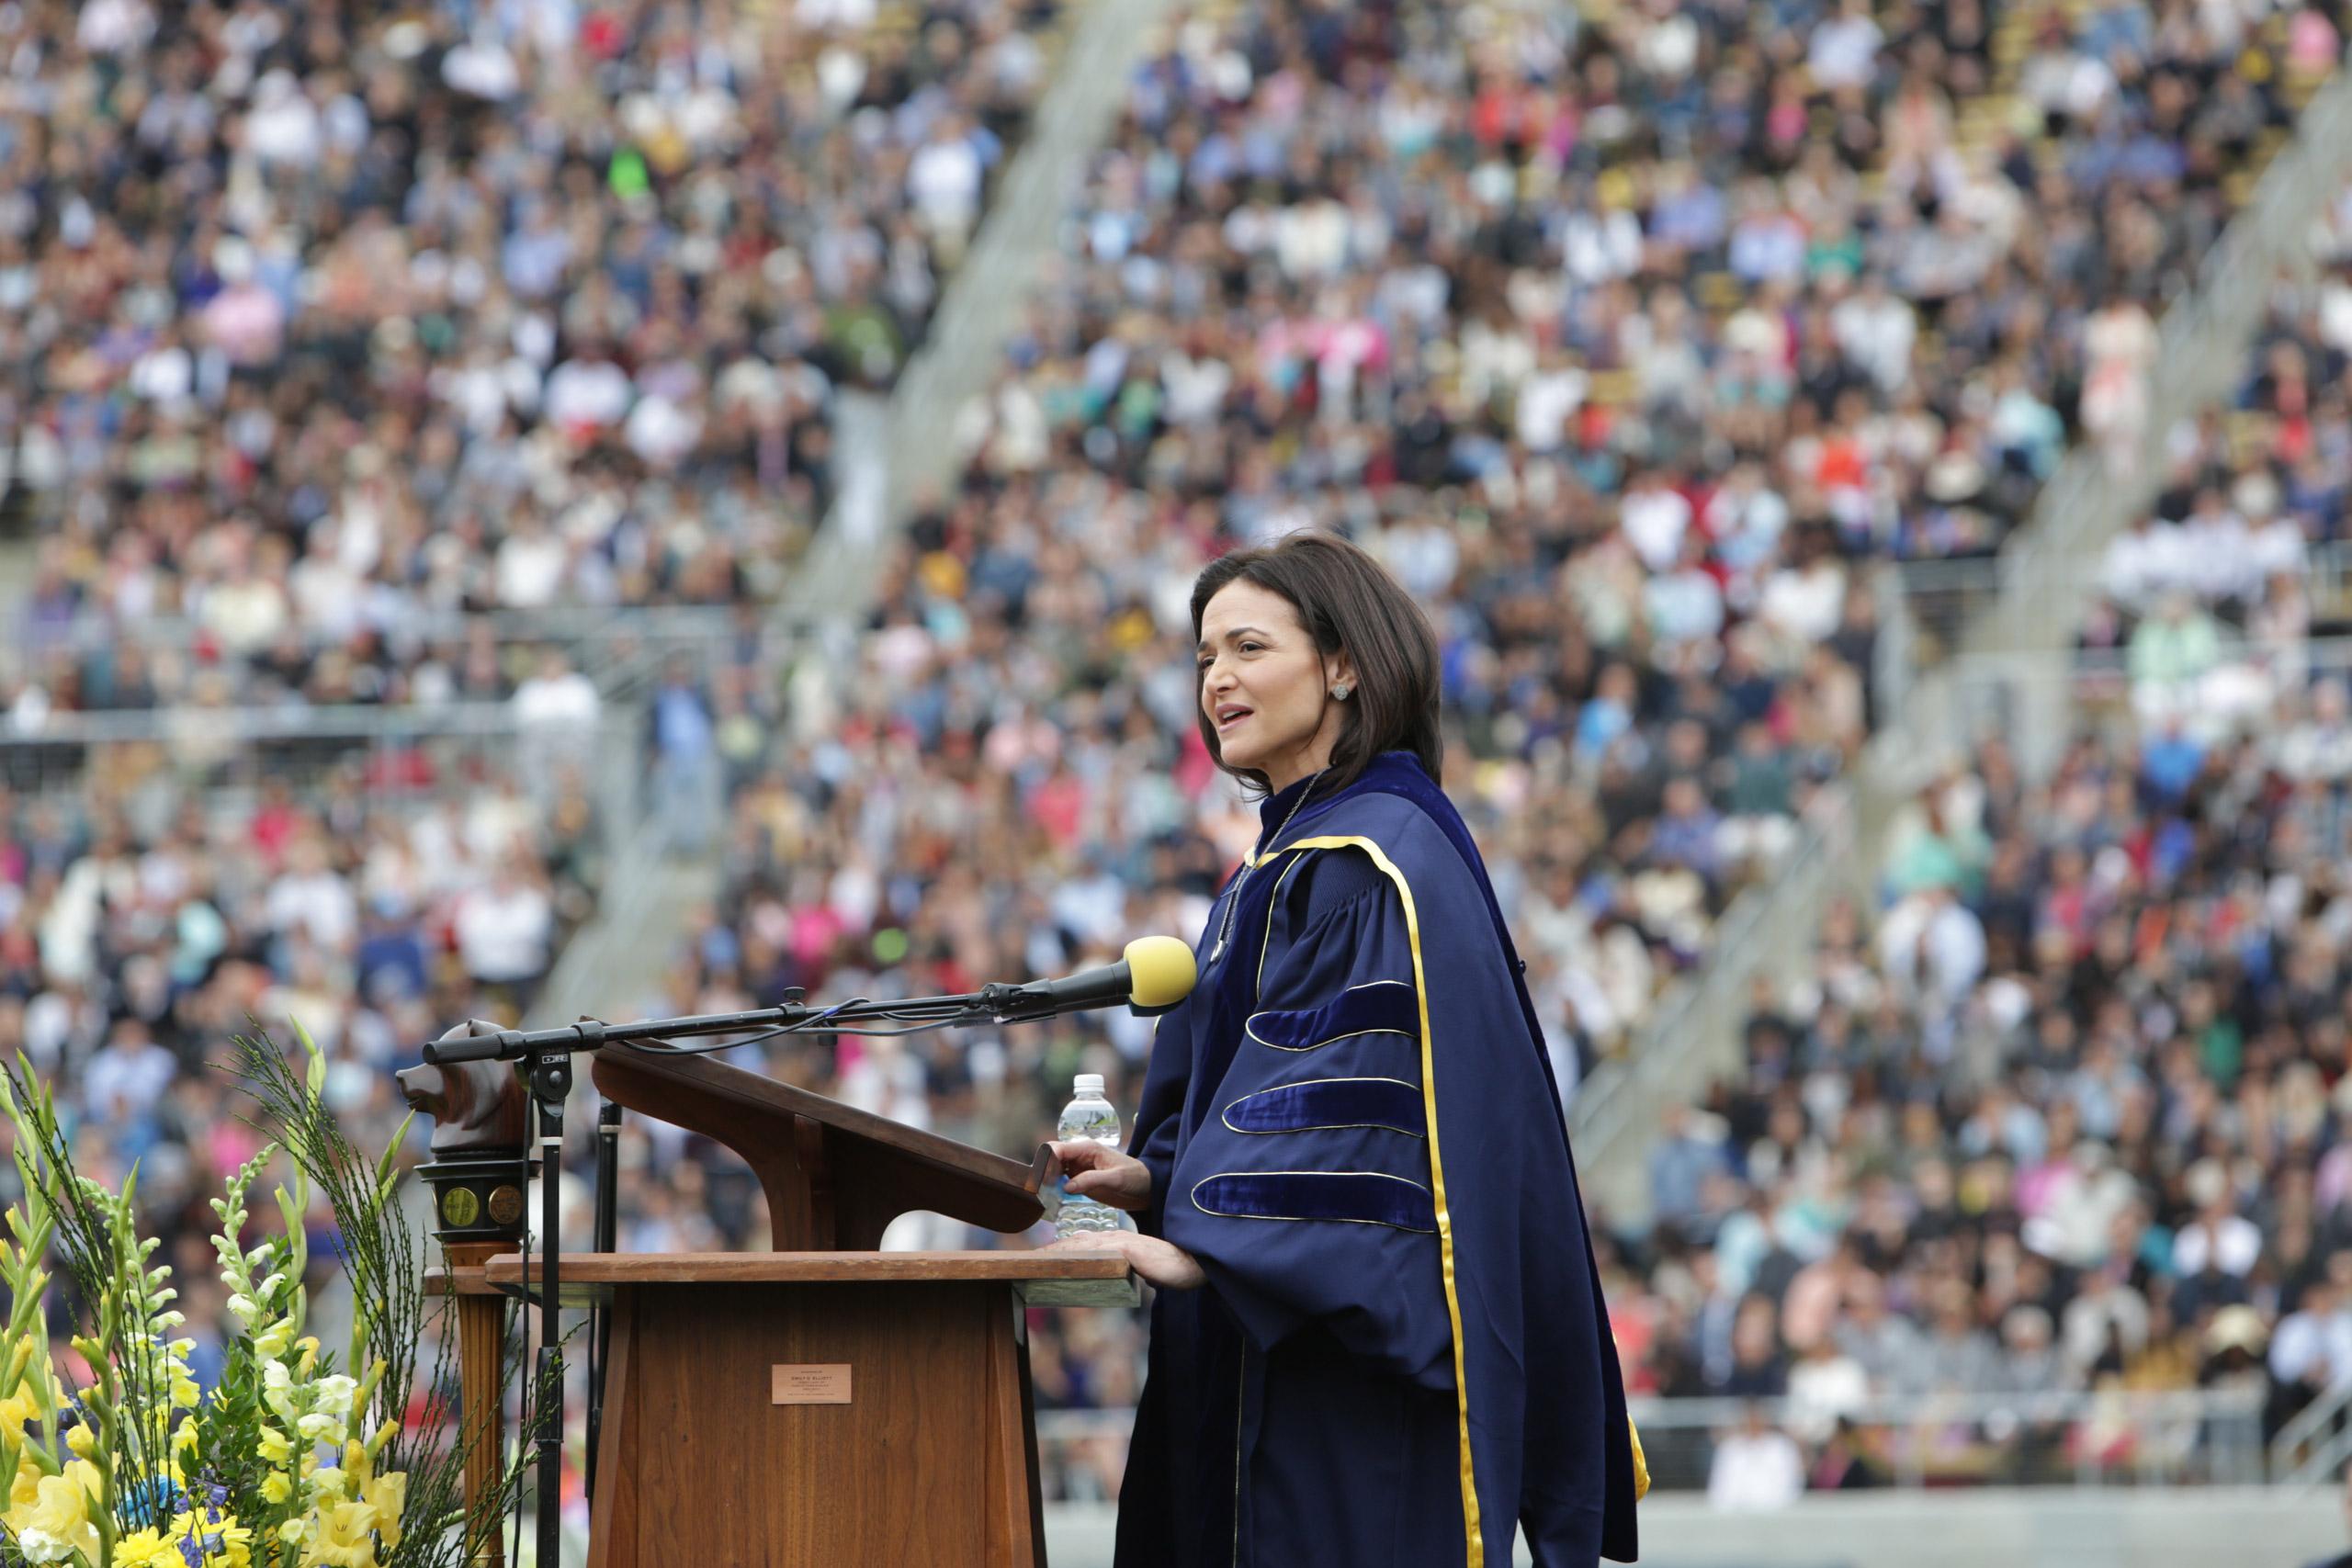 Sheryl Sandberg speaking at the University of California Berkeley commencement on May 14, 2016.